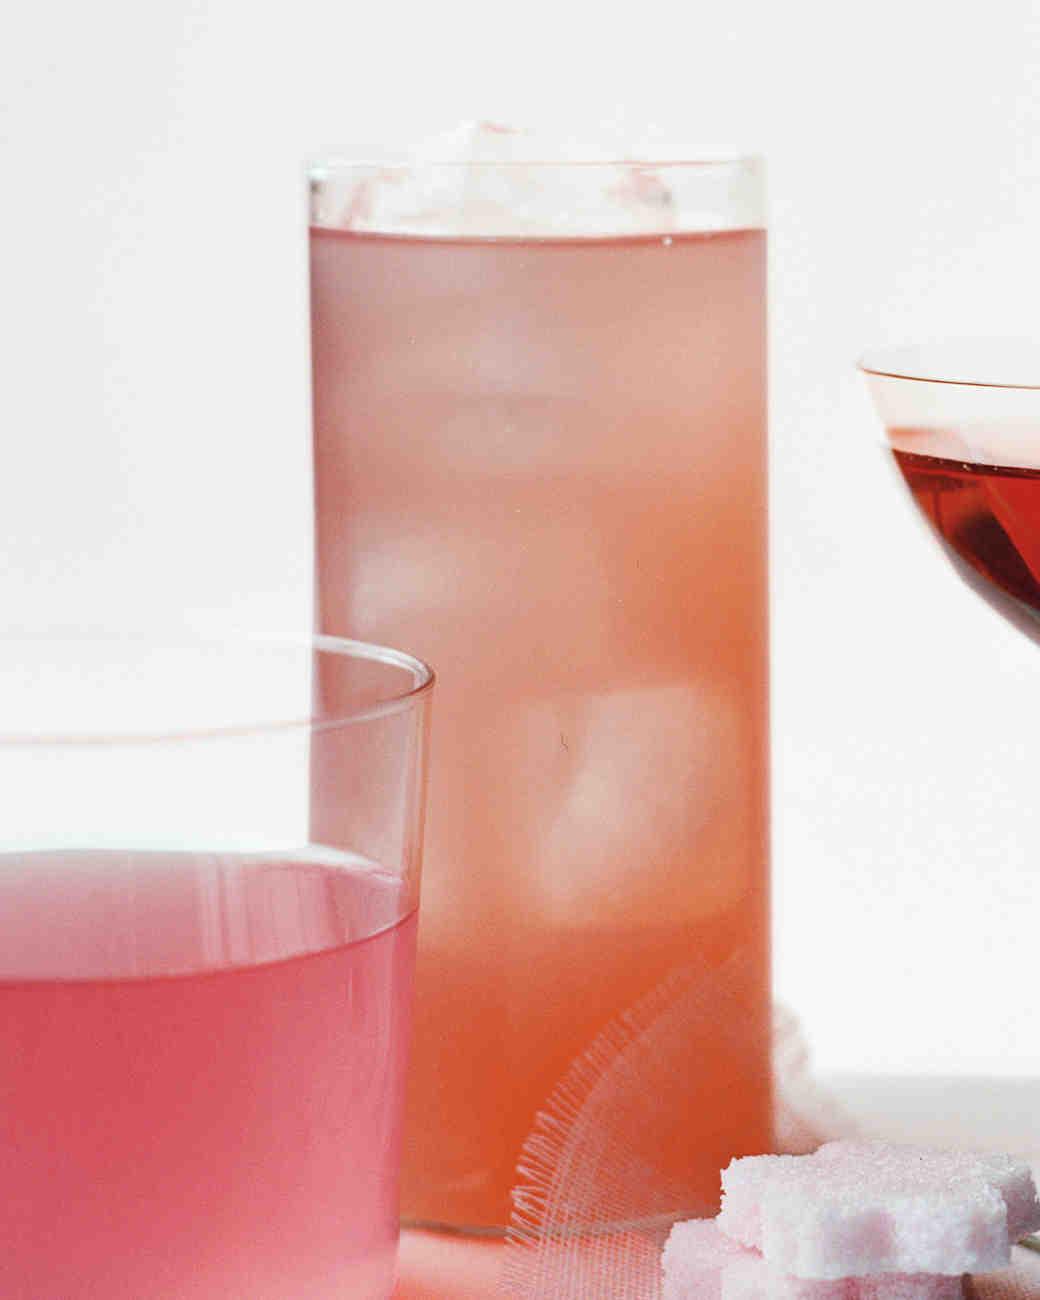 wedding-mocktail-recipes-cherry-blossom-tea-pink-lemonade-sp10-0915.jpg